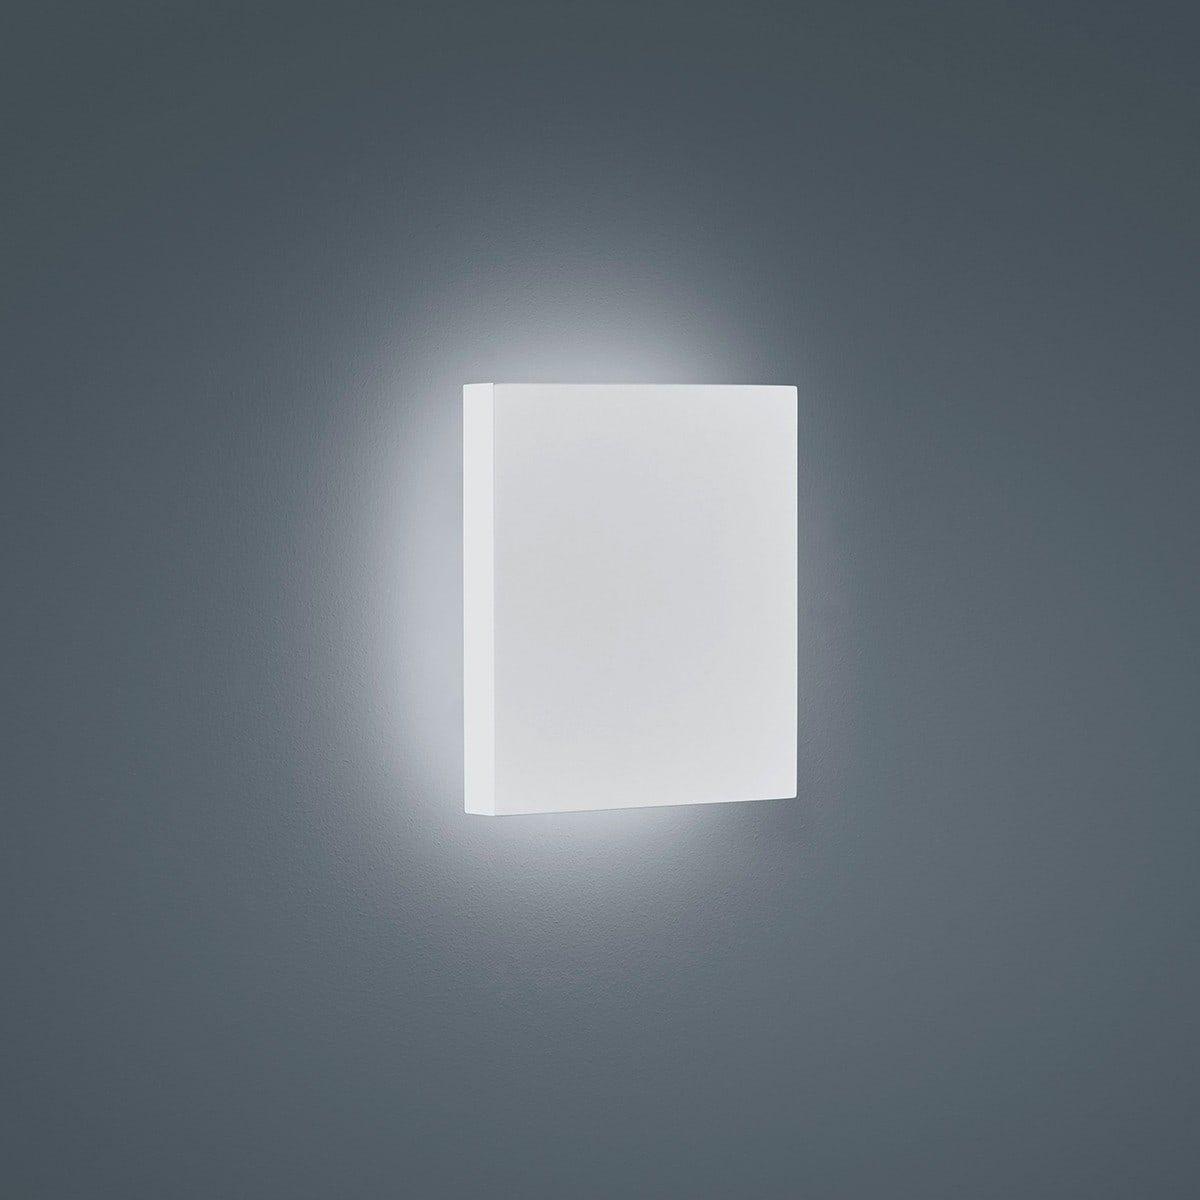 Aussenbeleuchtung Fur Terrassen Aussenleuchte Dark Led Solar Mit Bewegungsmelder Aussenlampen Edelstahl Wandleuchten Led Strahler Aussen Led Aussenwandleuchte